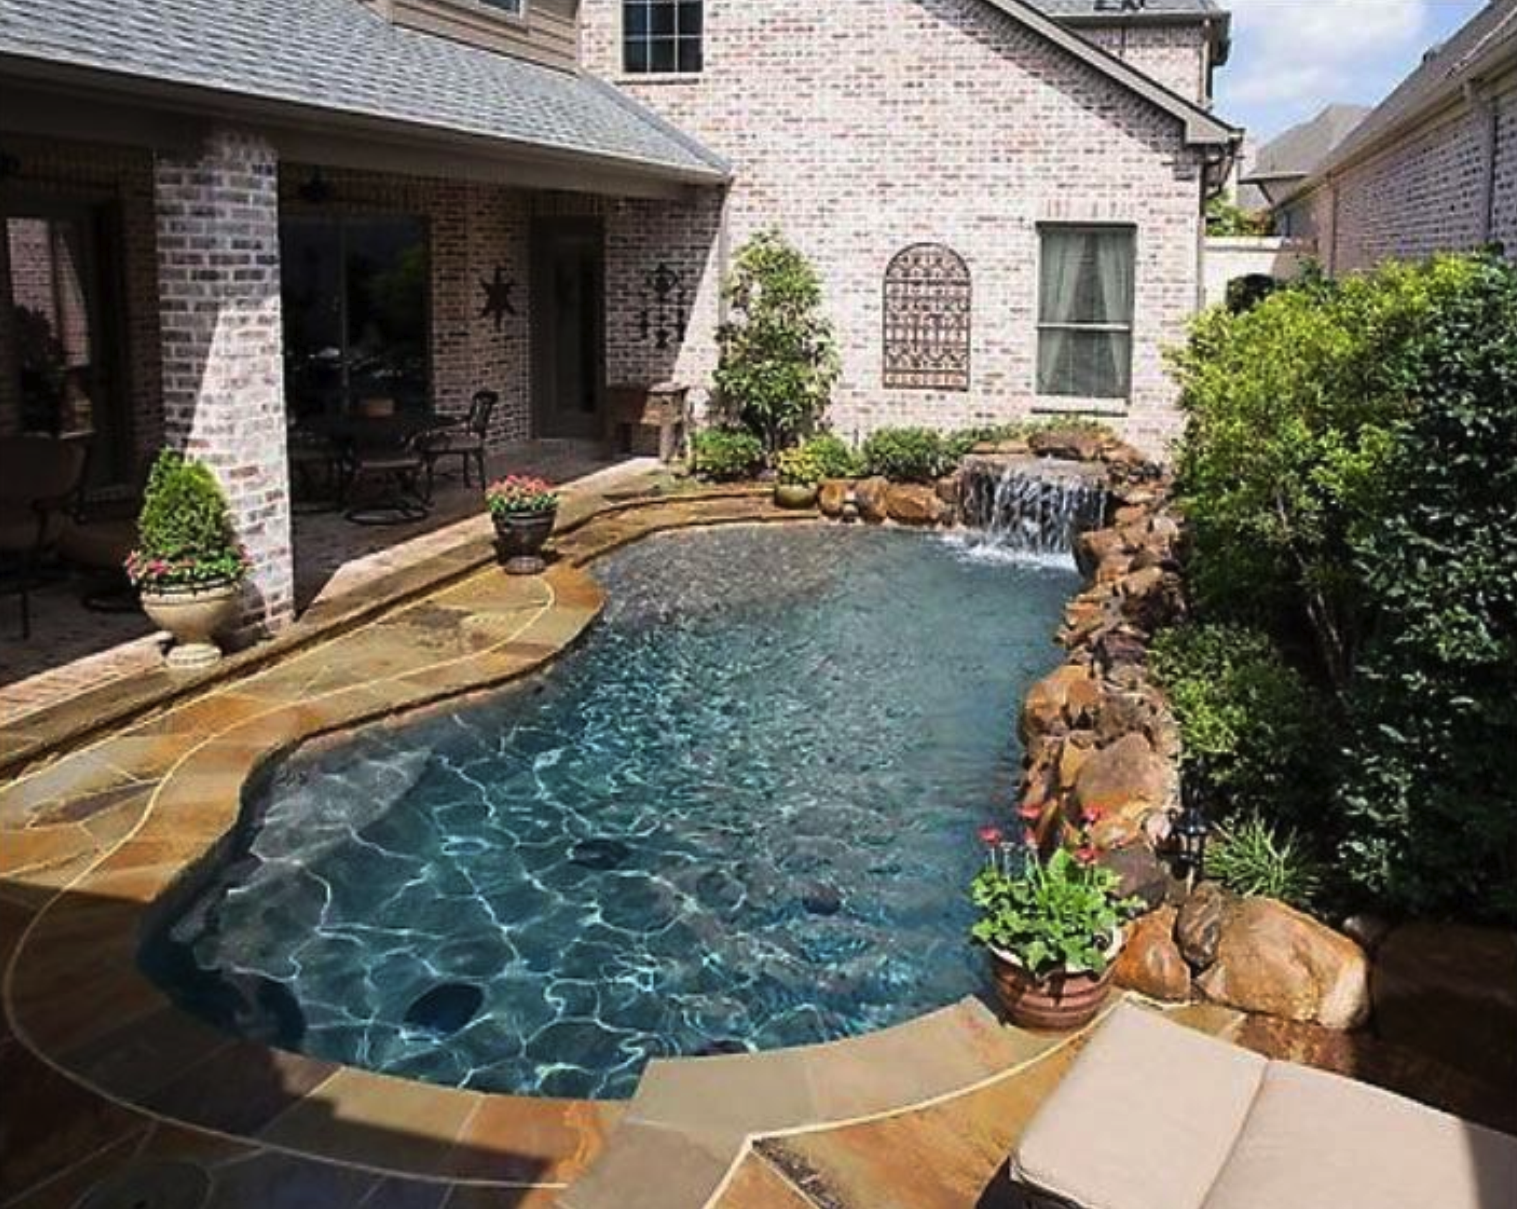 Dream pools Dream-pools Pools Small pools Swimming pools ... on Dream Backyard With Pool id=45561